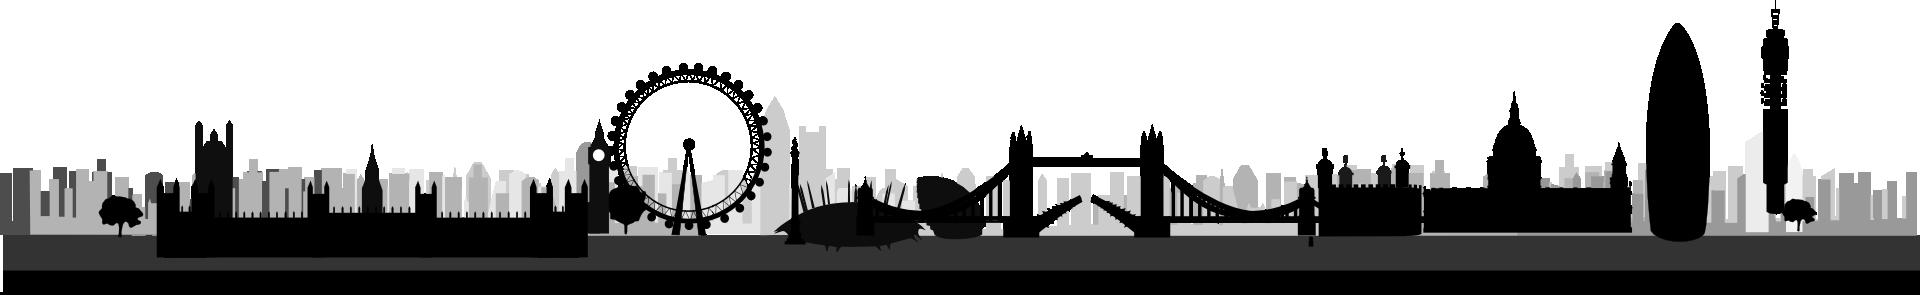 ldn_skyline